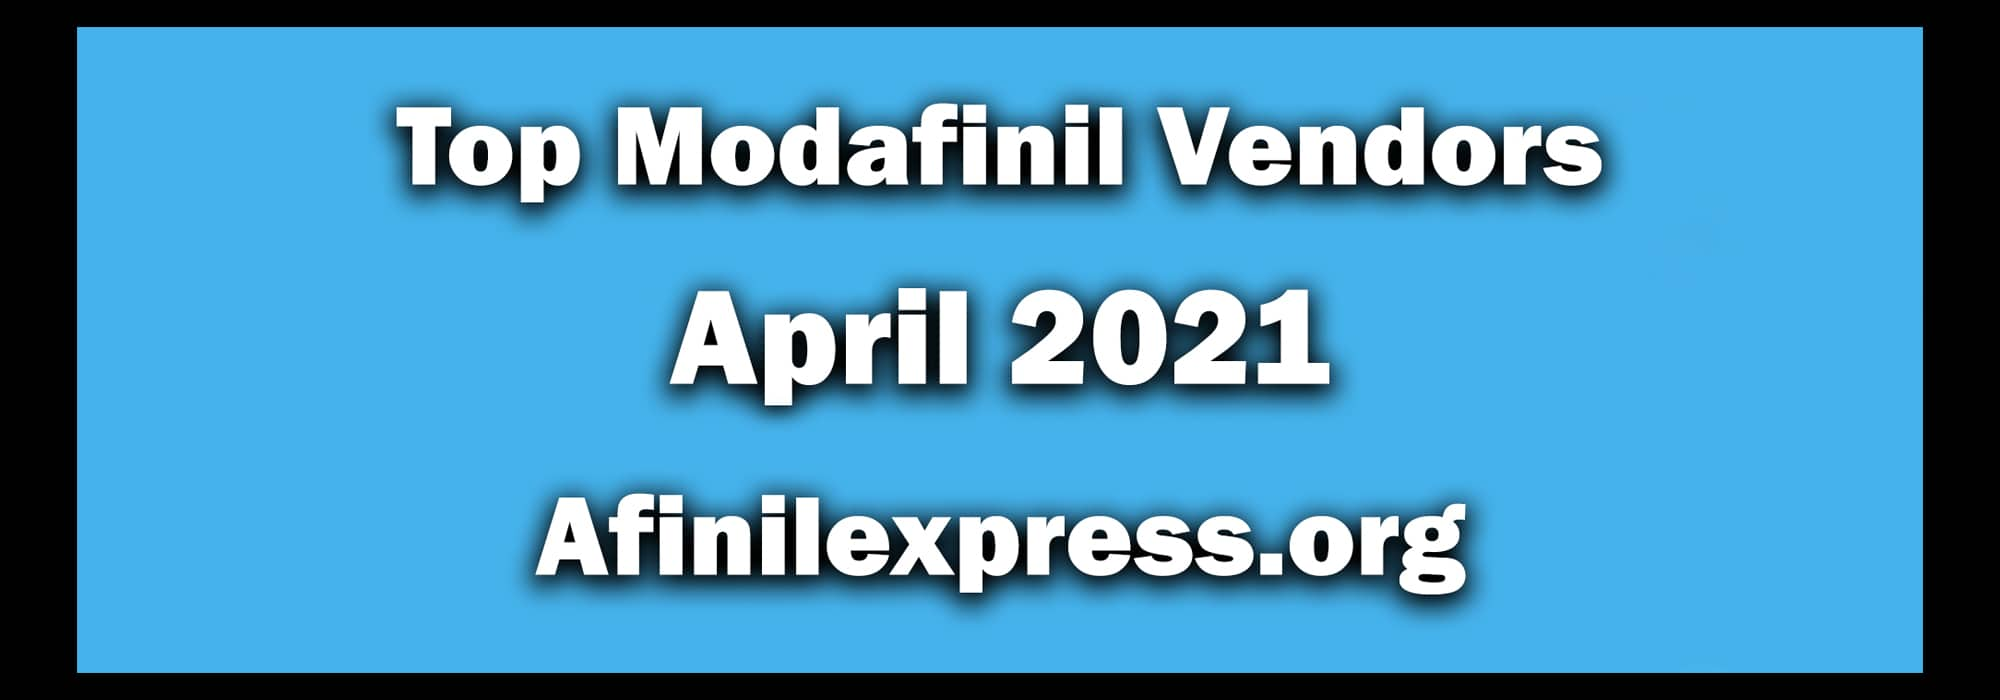 Top 3 Modafinil Vendors April 2021